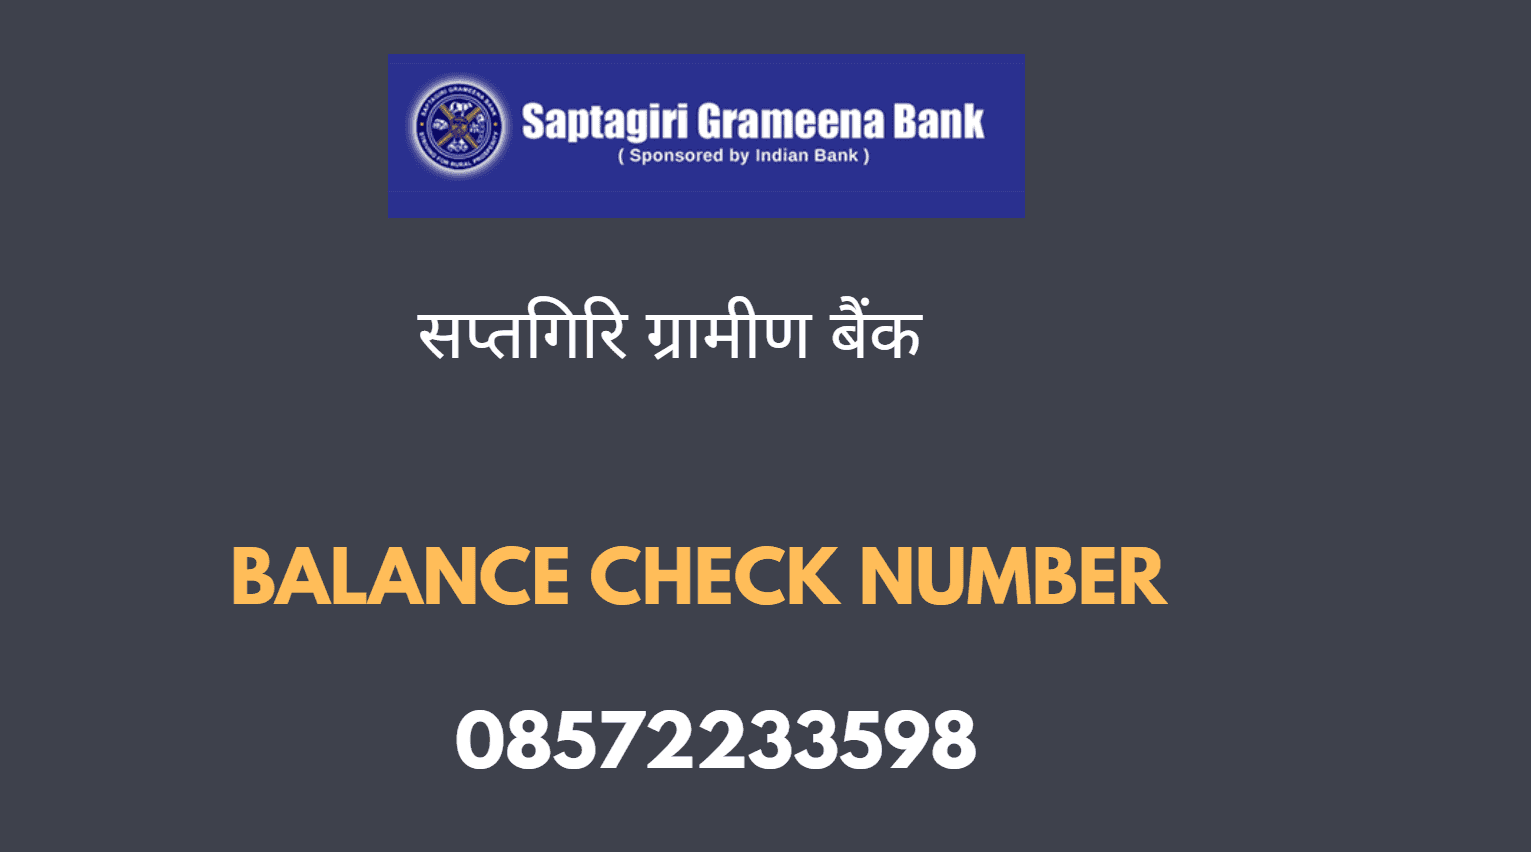 Saptagiri Grameena Bank balance Check Number